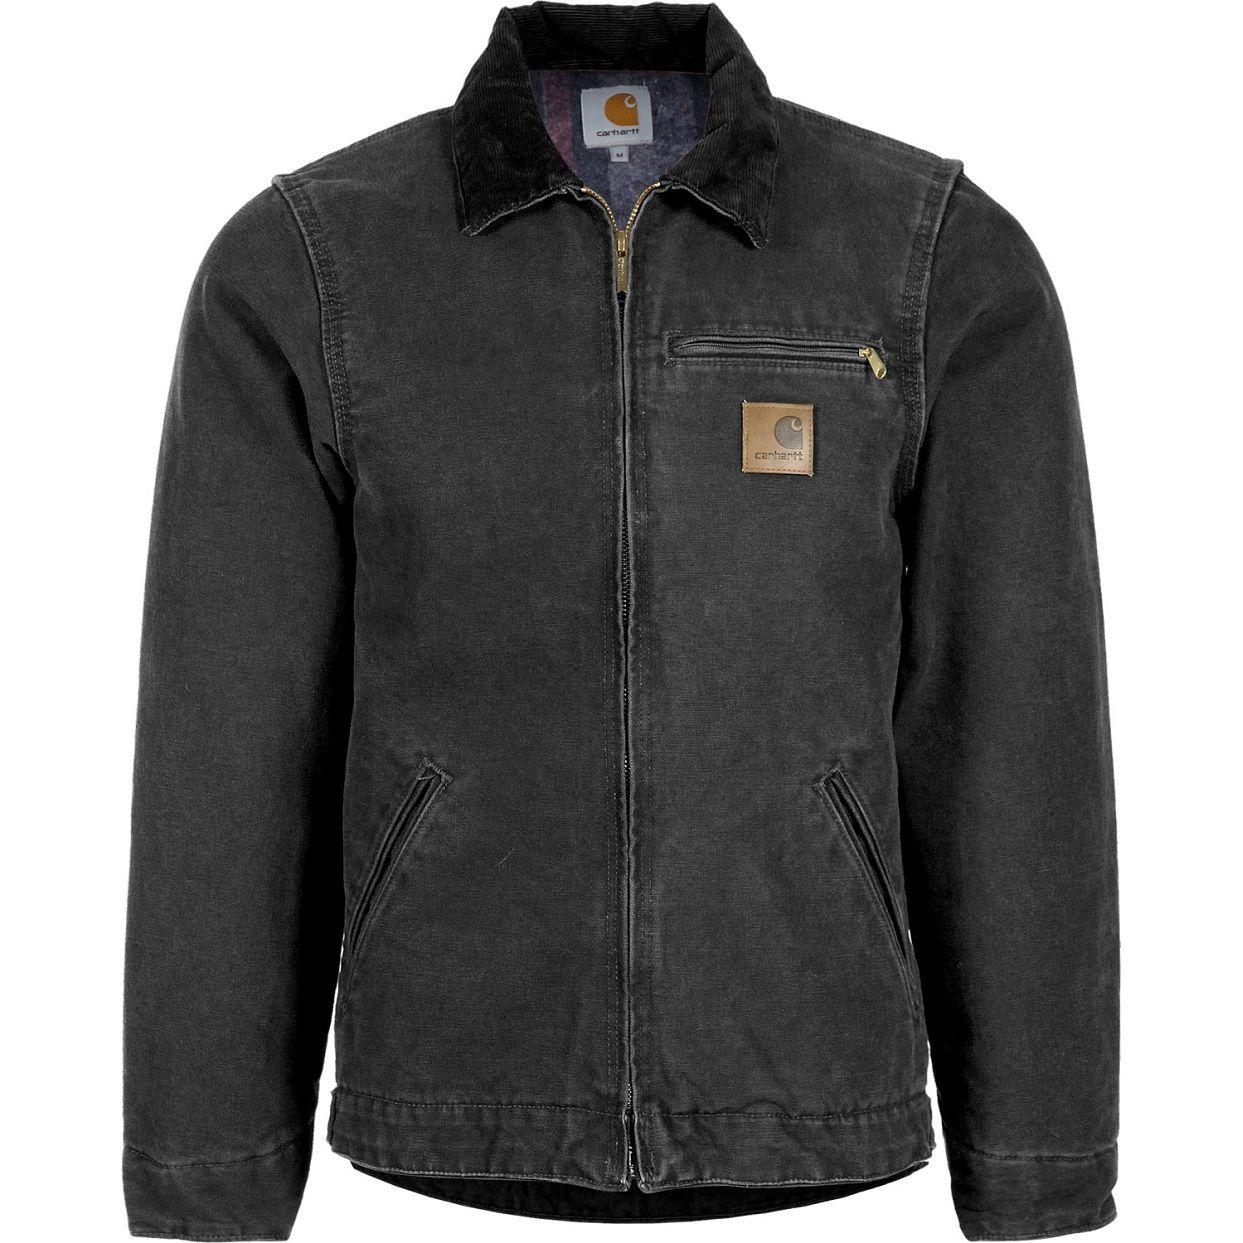 Carhartt Detroit Jacket (Herr)